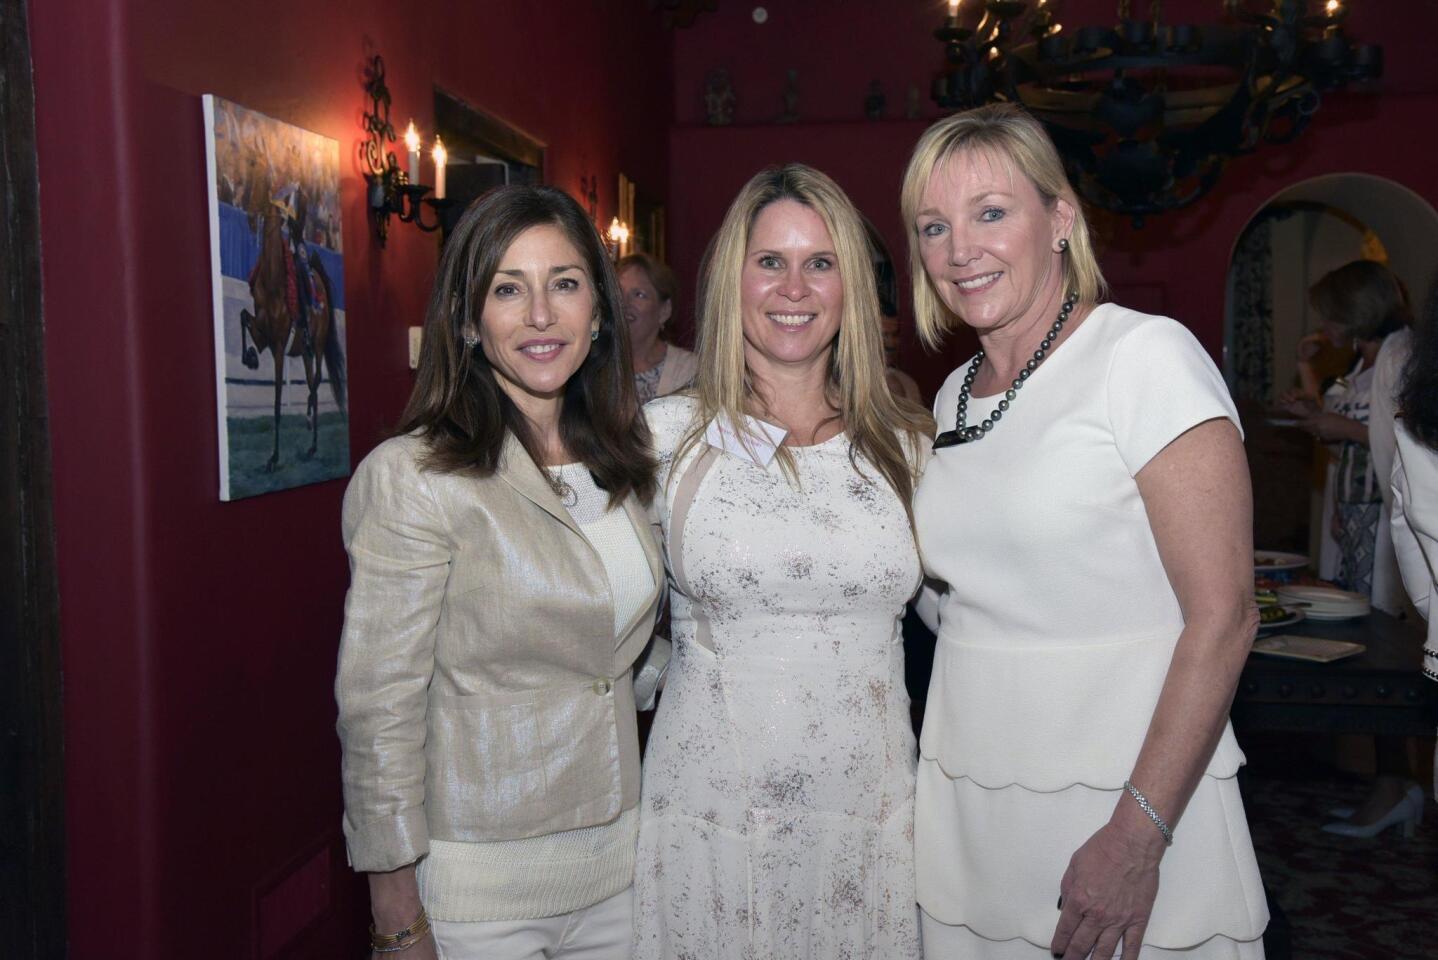 Judy Rowles, Bree Bornstein, Ellie Cunningham